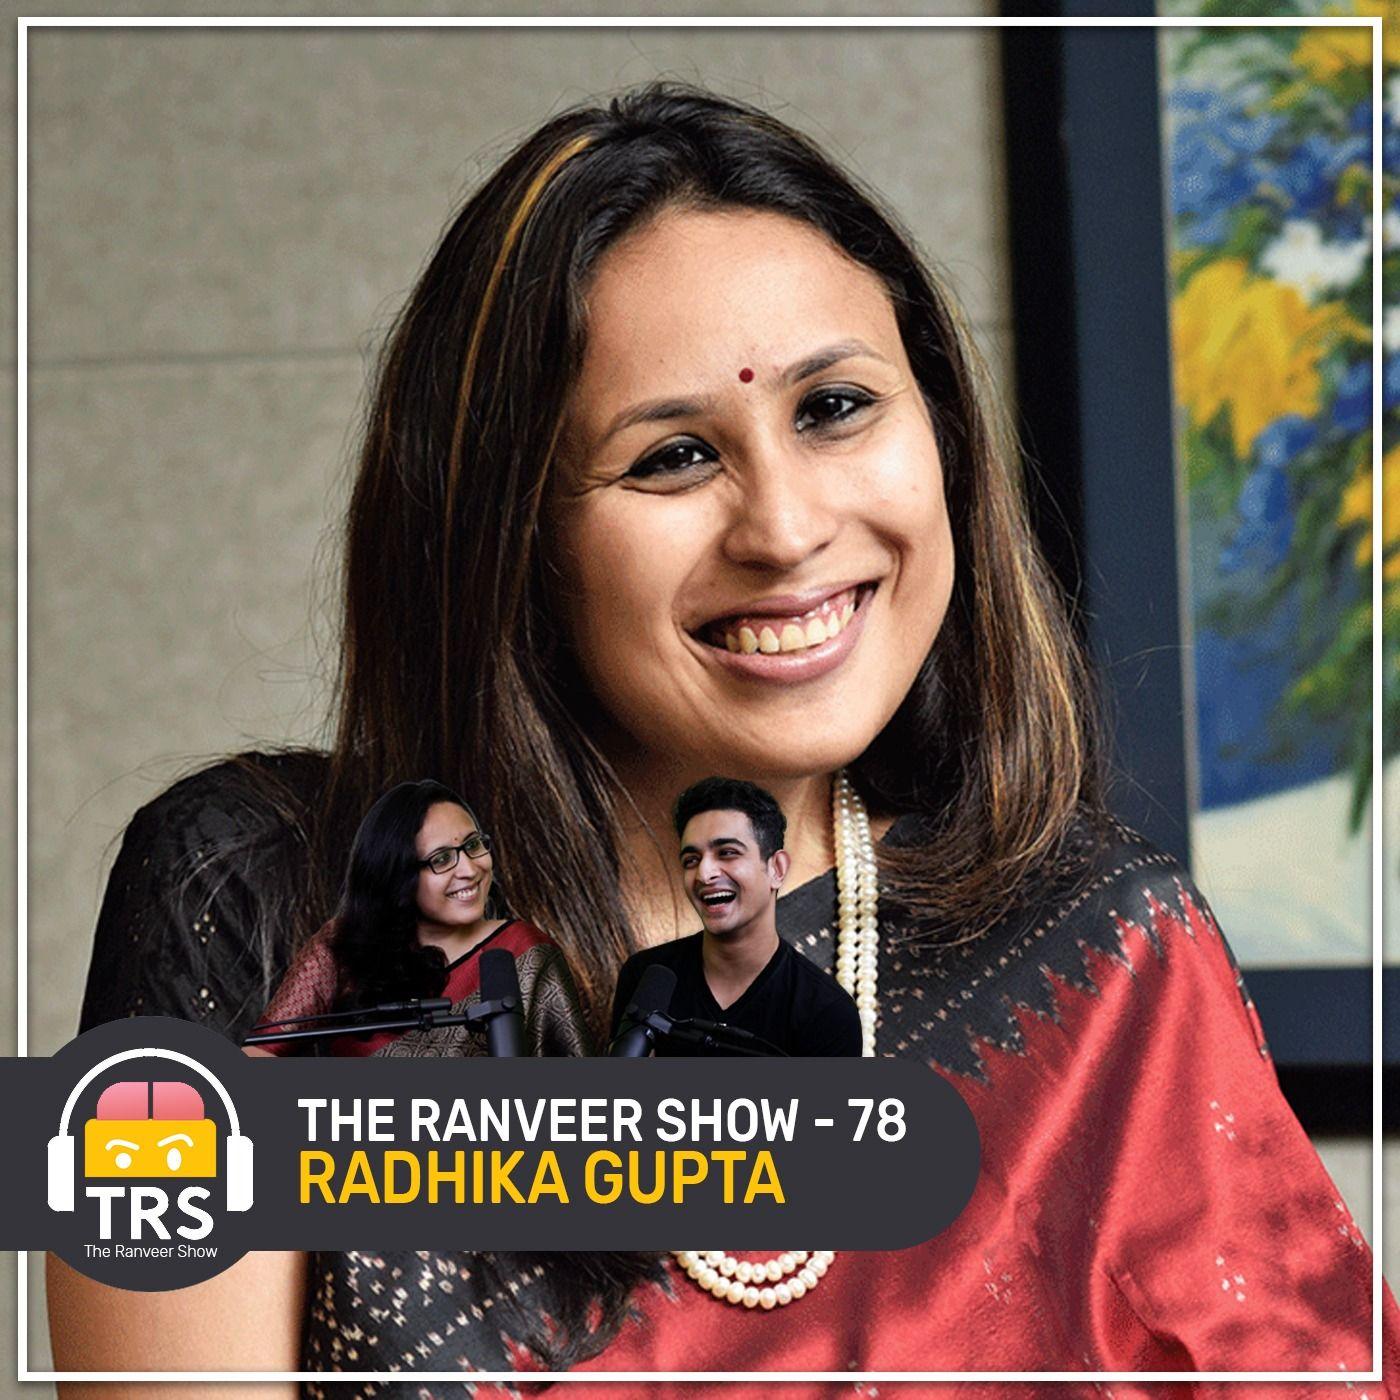 CEO Radhika Gupta On Overcoming Suicide, Feminine Energy, Goals & Ambitions | The Ranveer Show 78